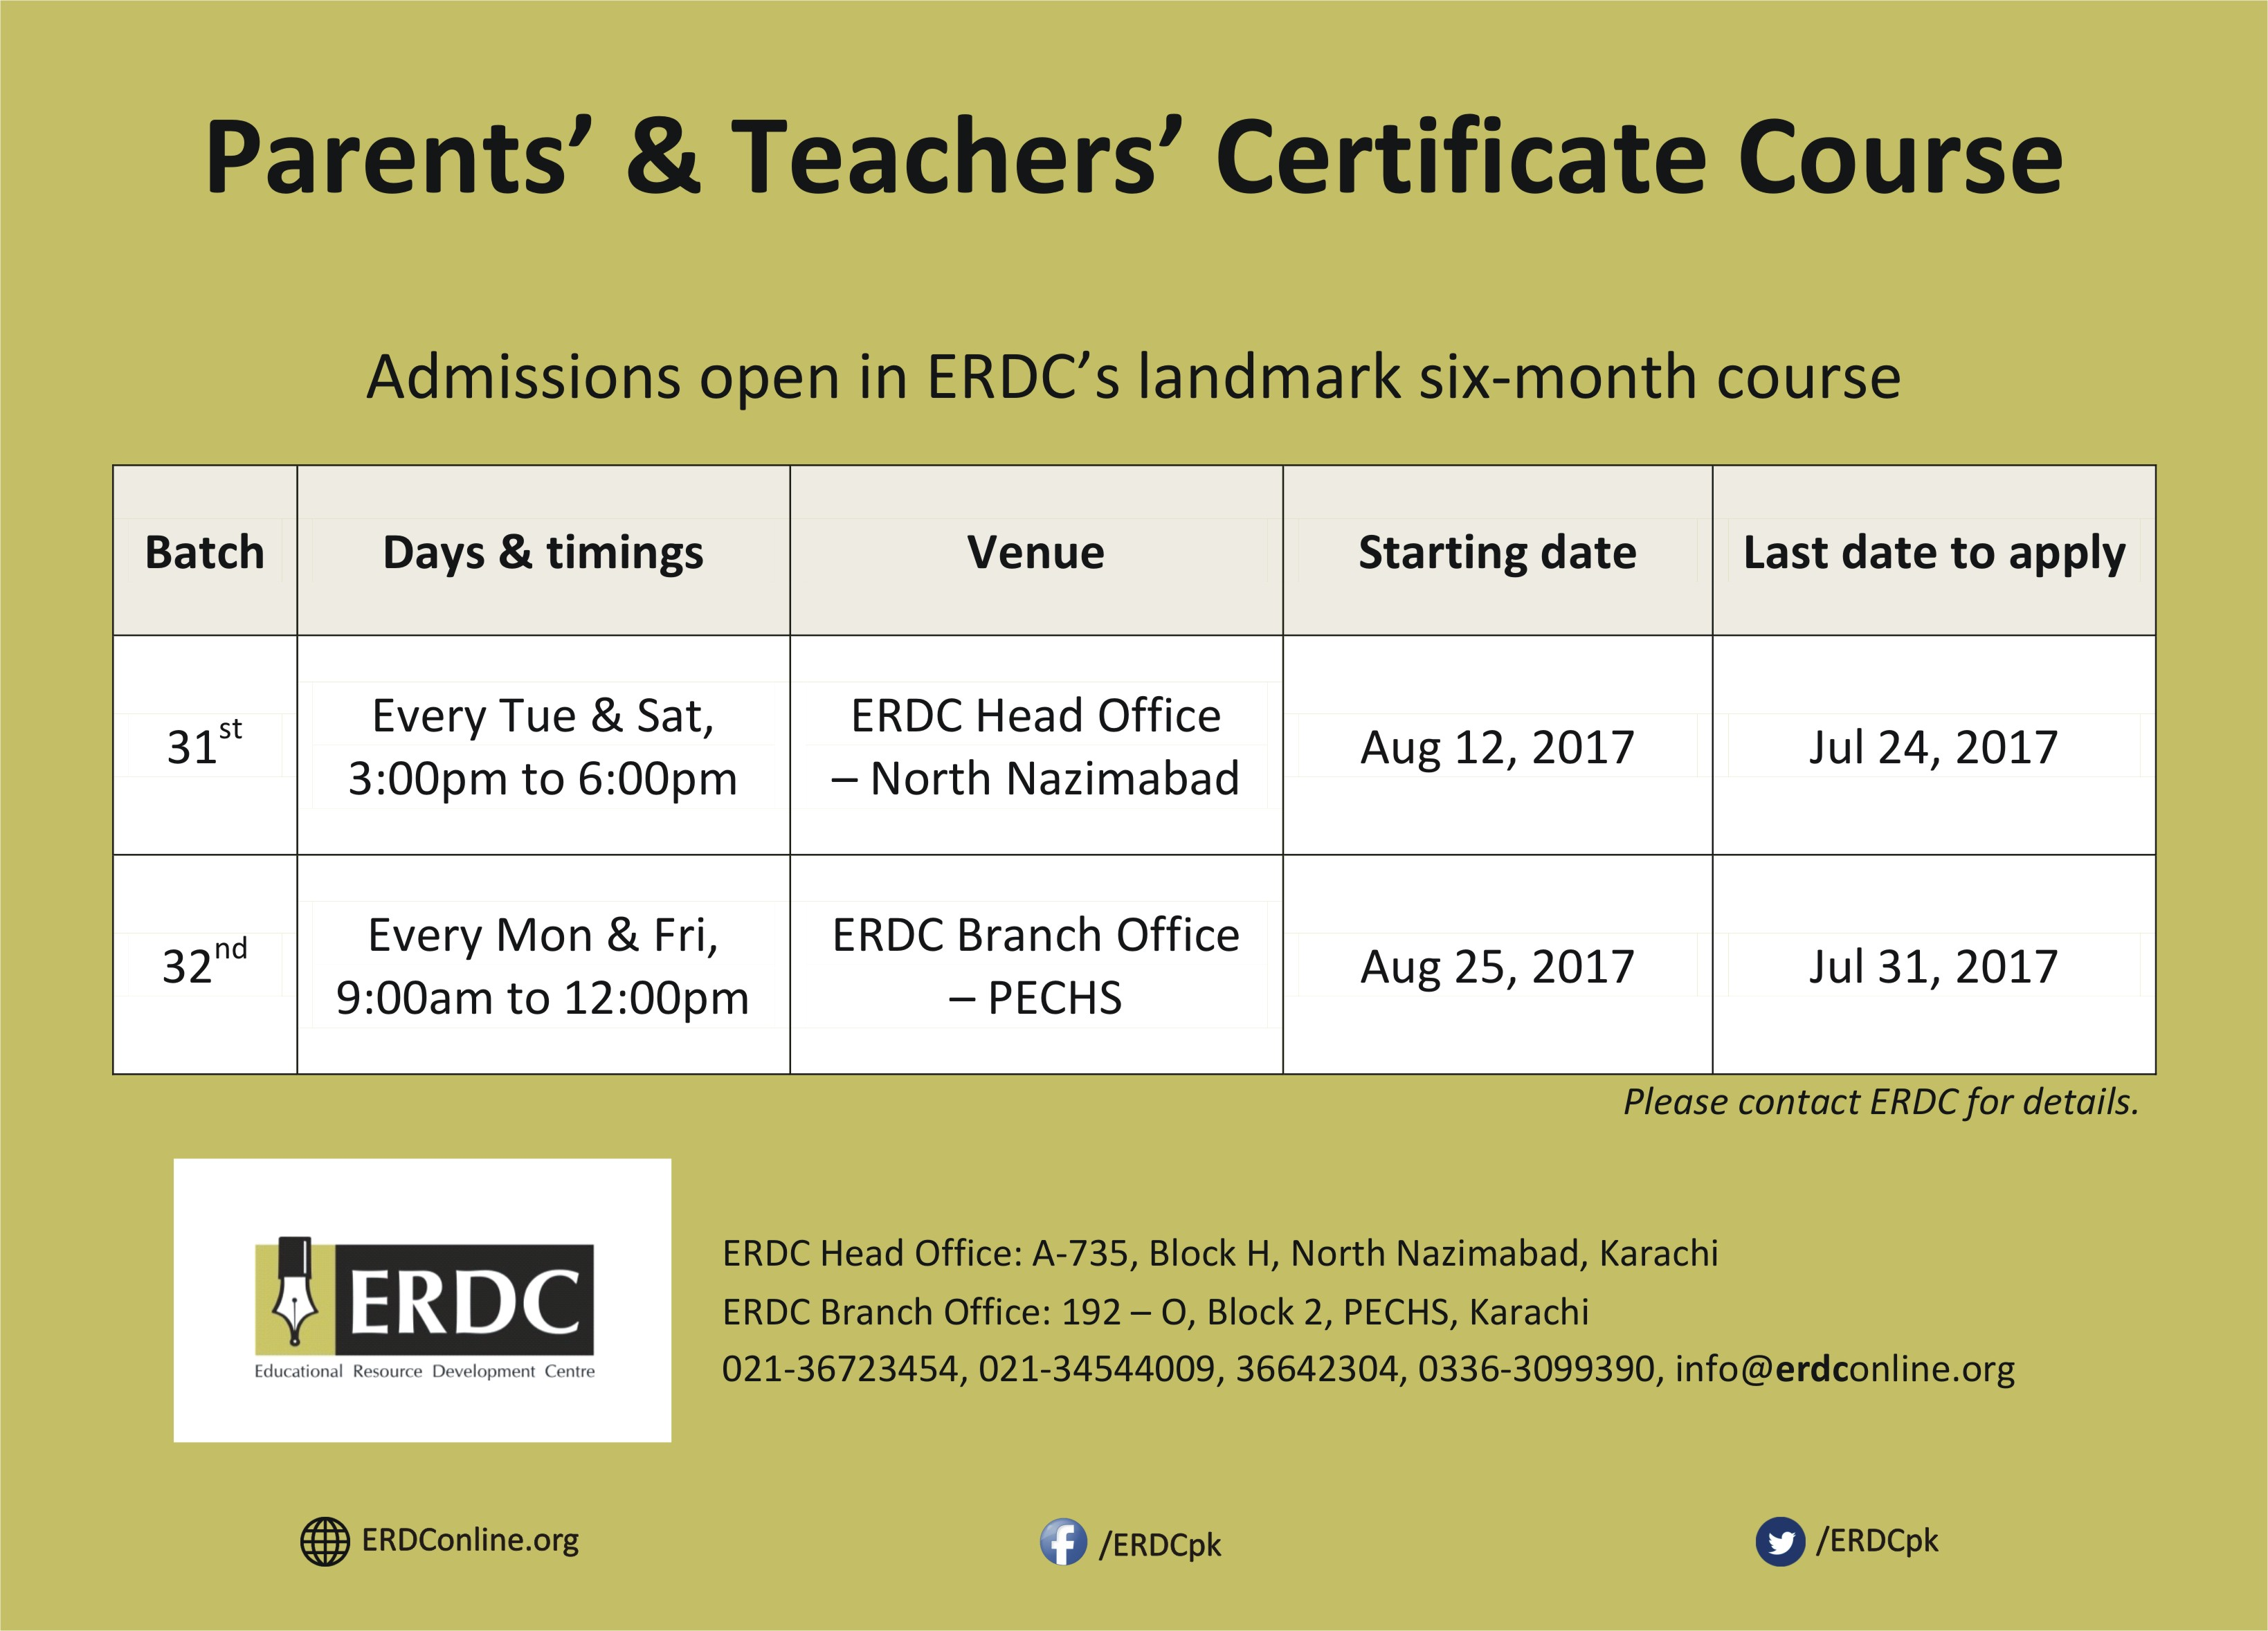 ptcc parents teachers certificate course erdc